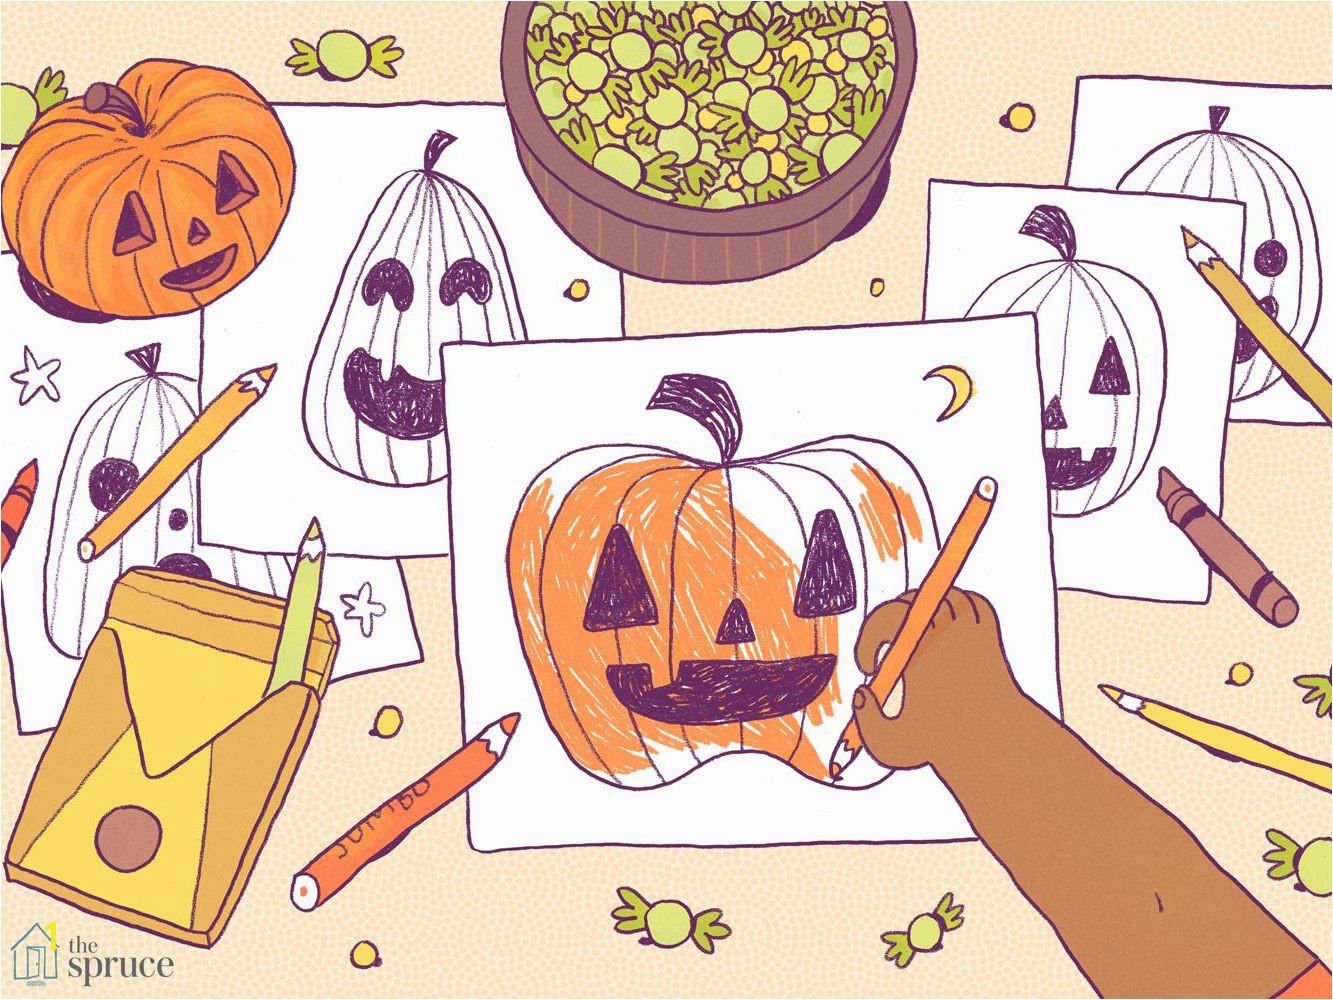 pumpkin coloring pages for kids FINAL c8c50a d9cd ad3dd2d